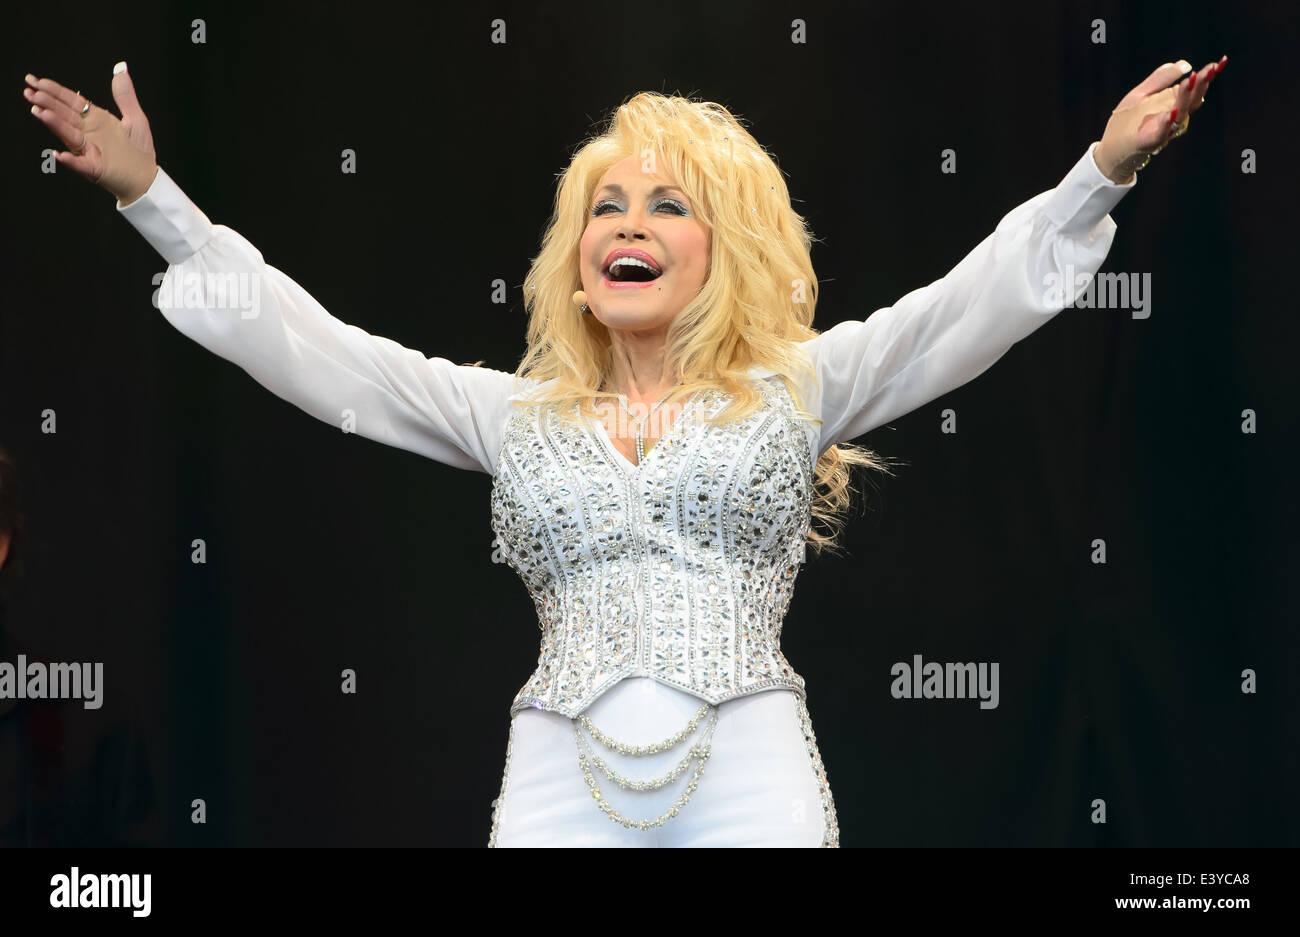 Dolly Parton führt beim Glastonbury Music Festival, England, Sonntag, 29. Juni 2014. Stockbild